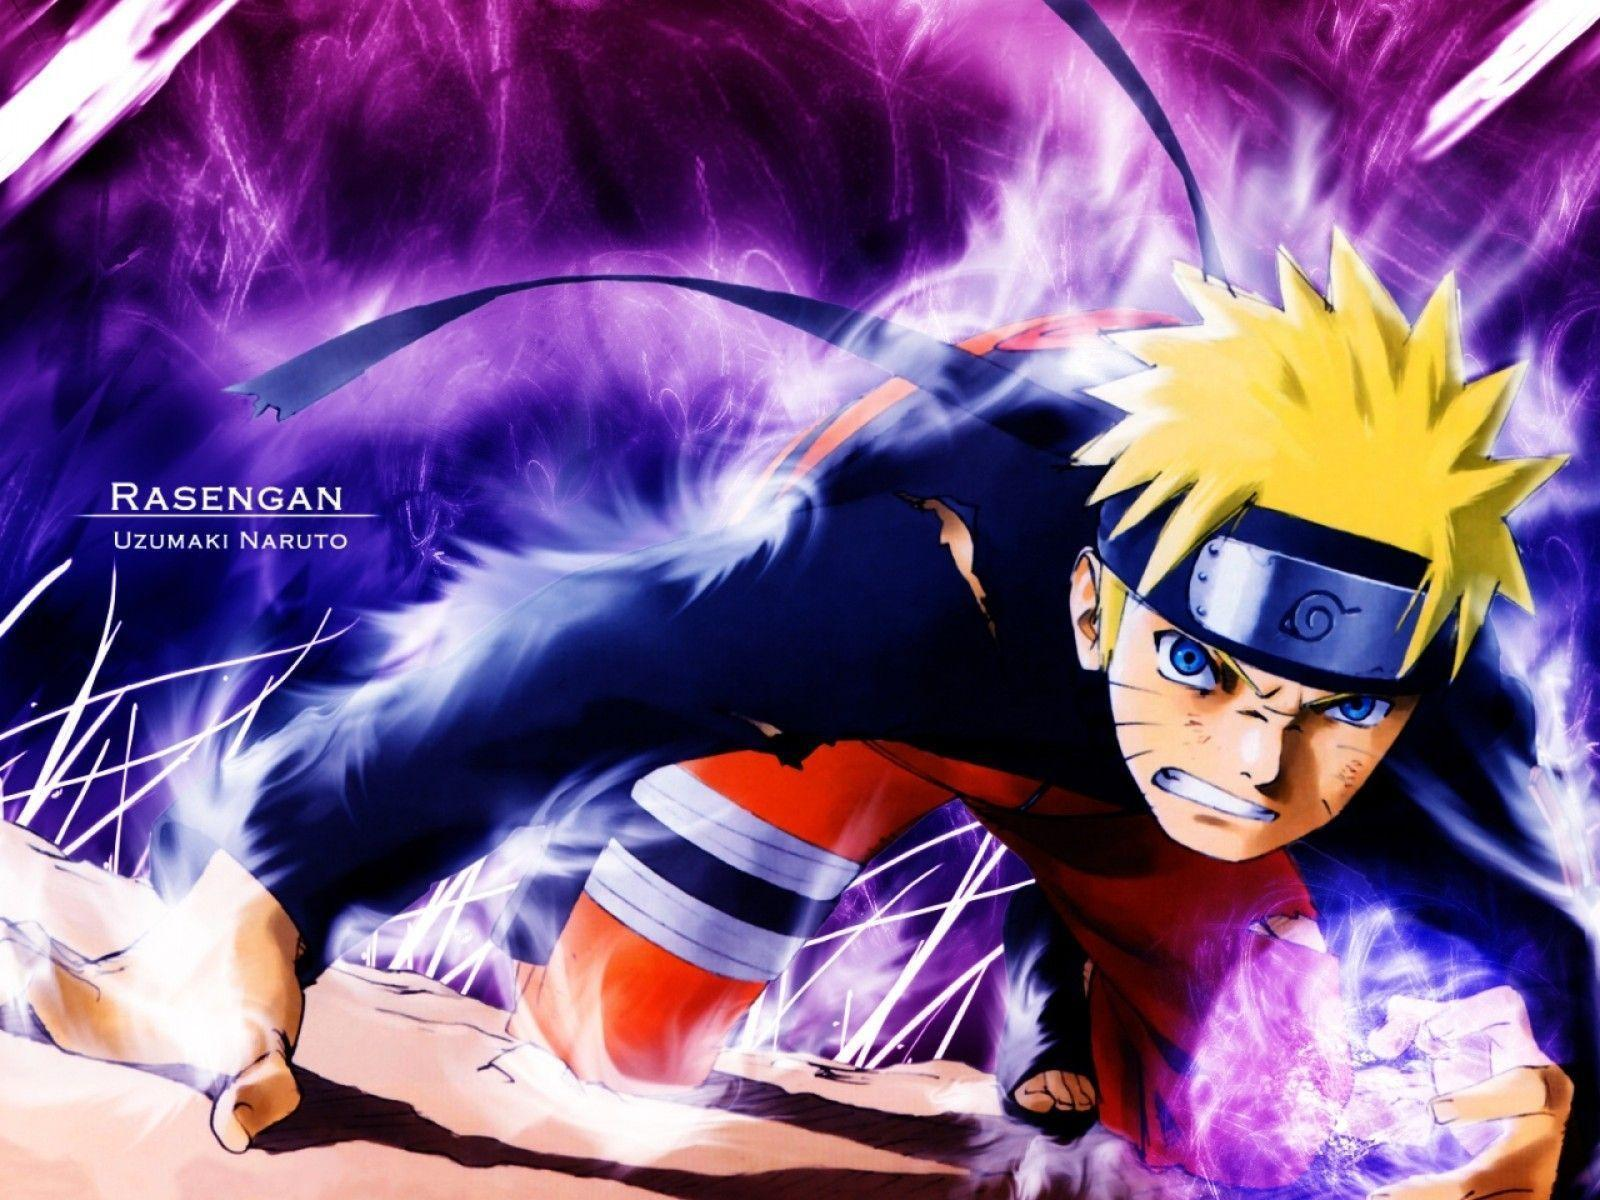 Naruto Shippuden - Rasengan HD Wallpaper | Animation Wallpapers